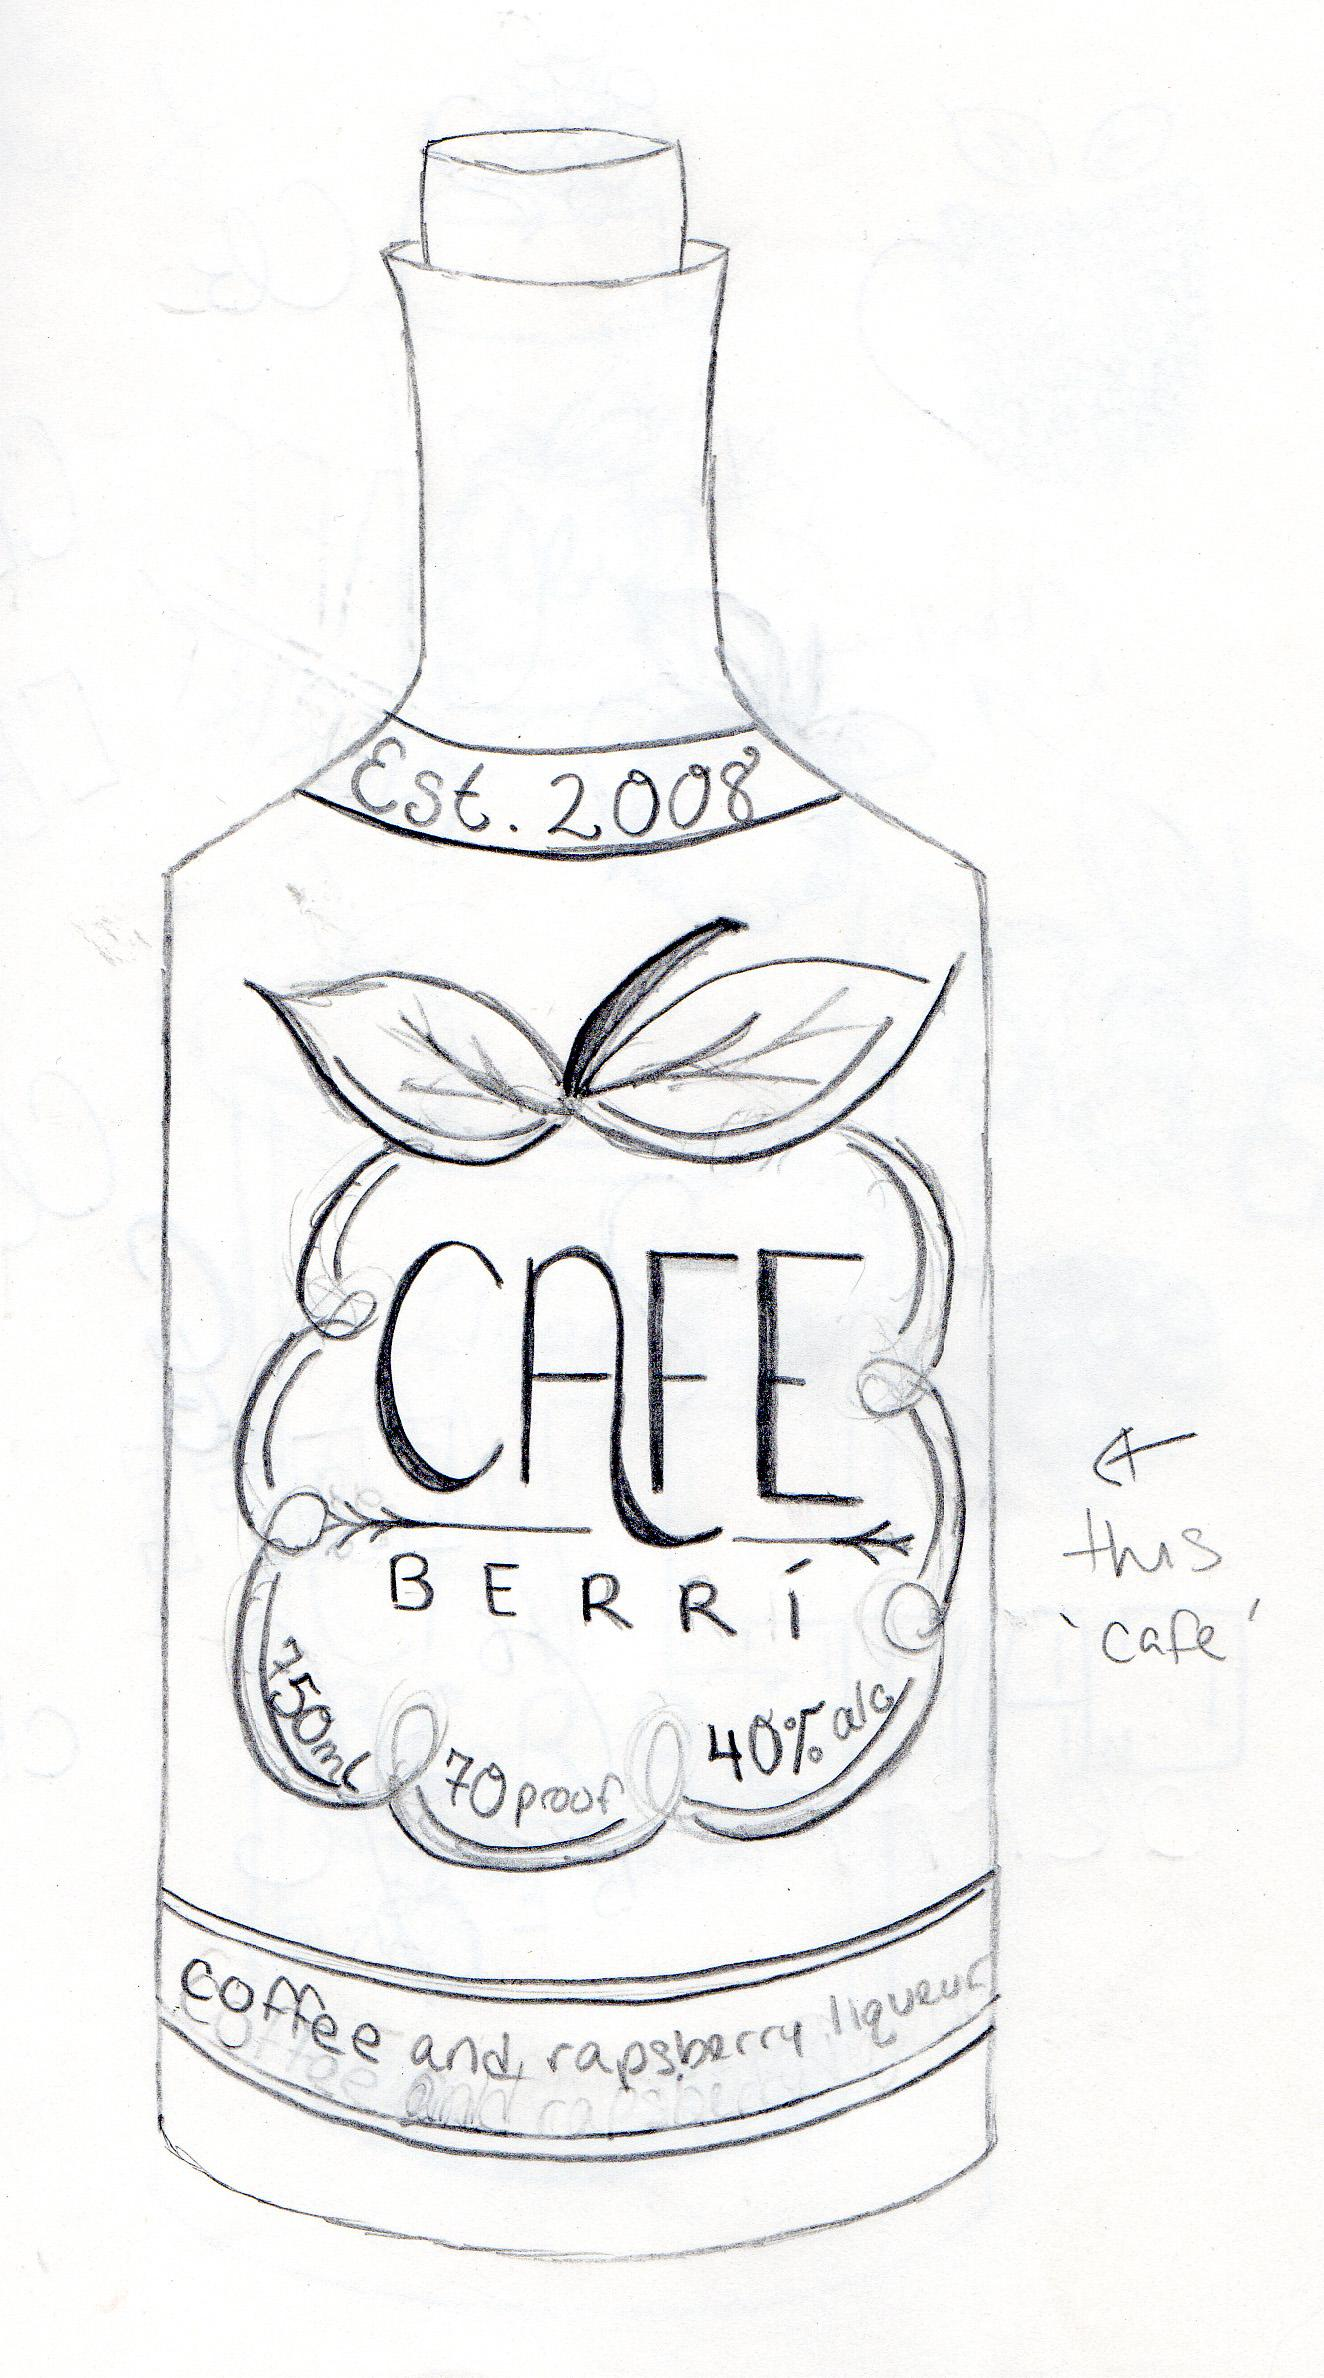 Cafe Berrí - image 5 - student project